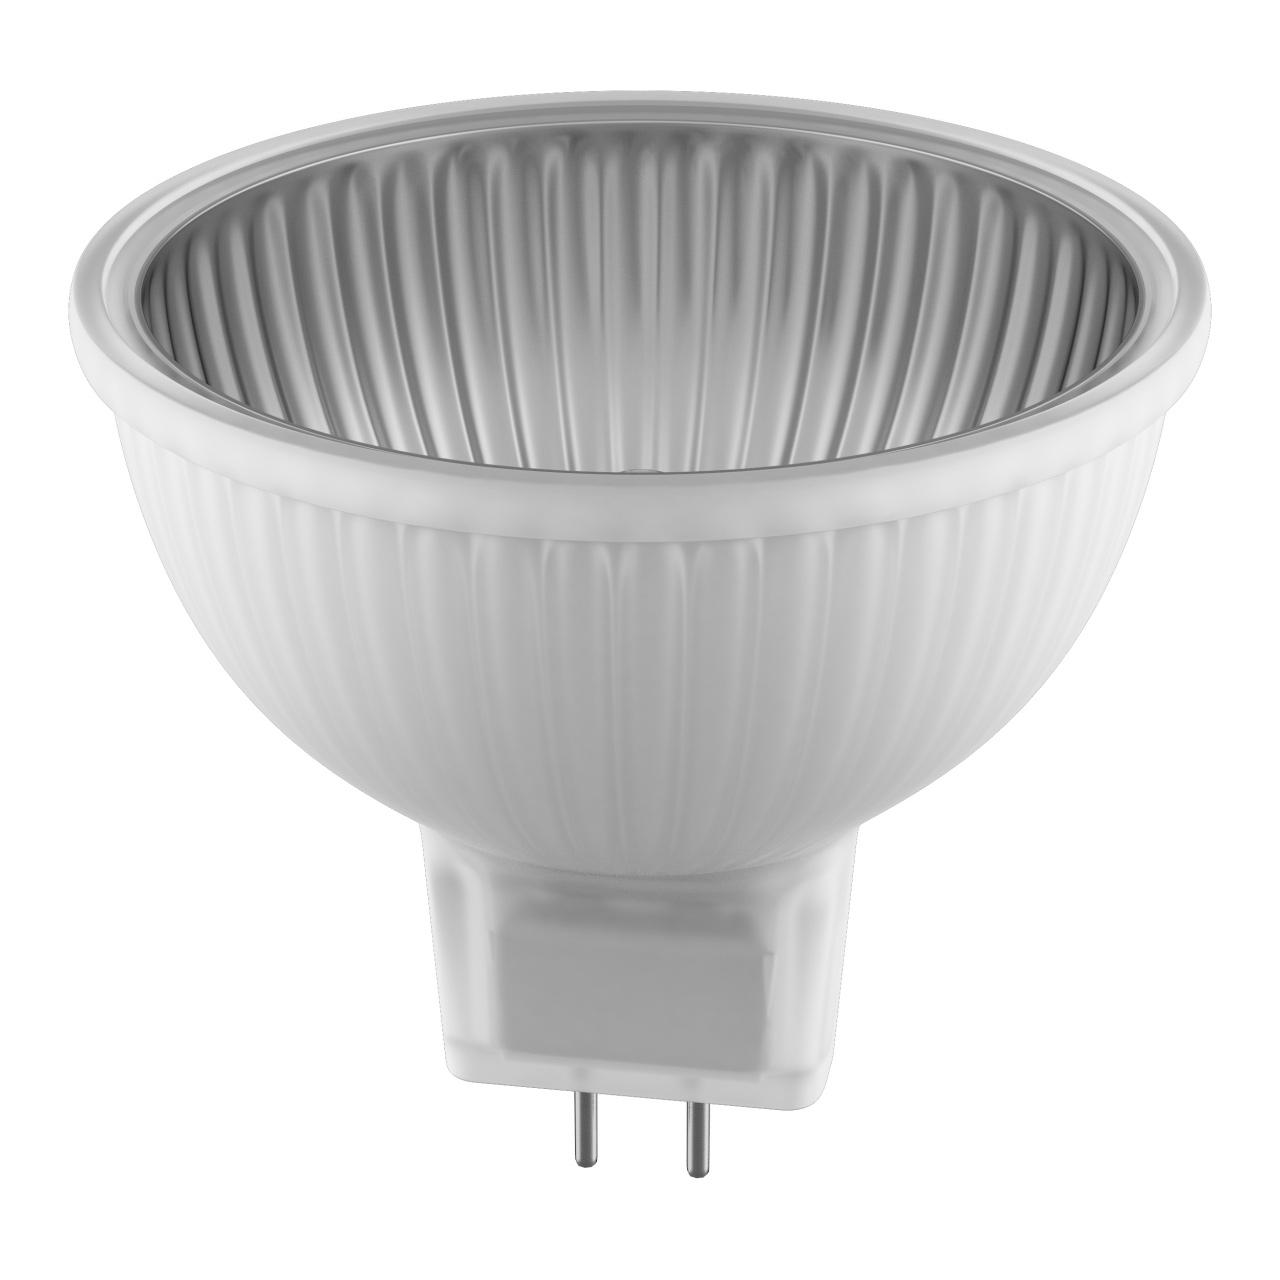 Лампа HAL 220V MR16 G5.3 35W 60G ALU RA100 2800K 2000H DIMM Lightstar 922105